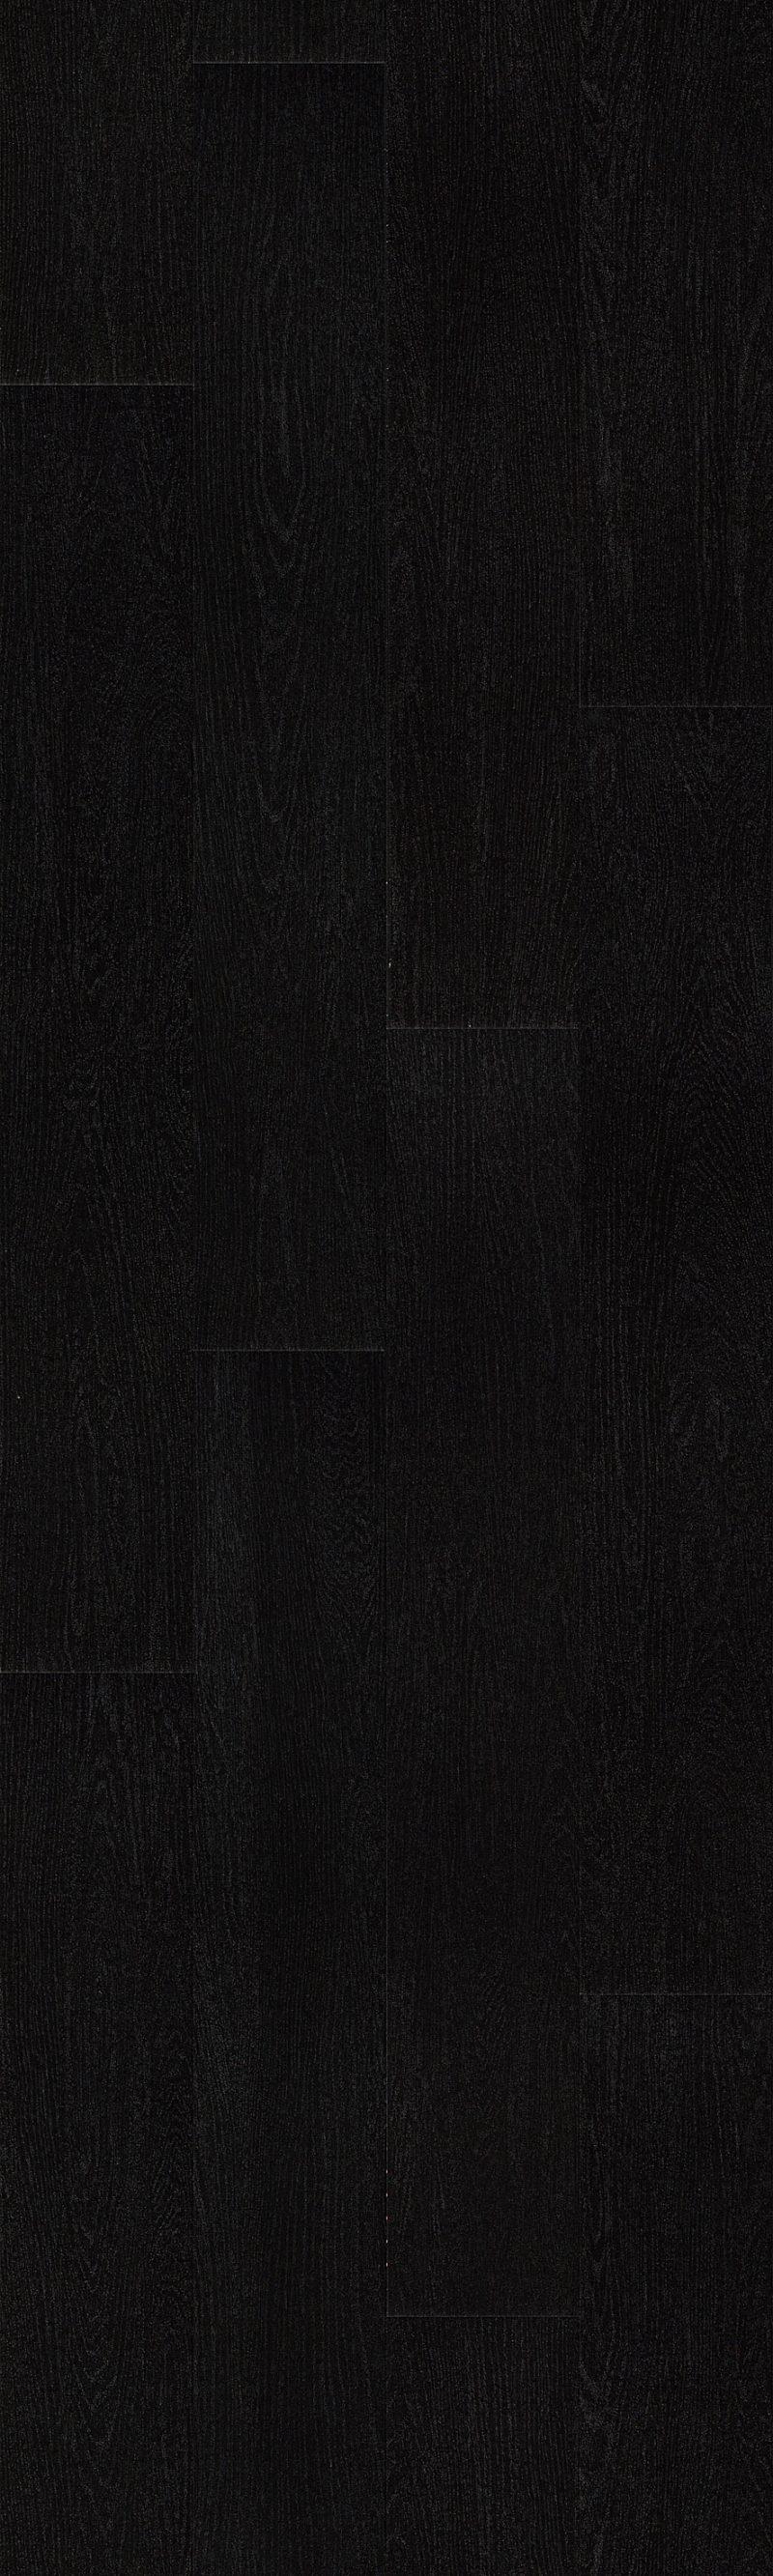 Vinilinės grindys lentelėmis Forbo Allura Wood charcoal solid oak